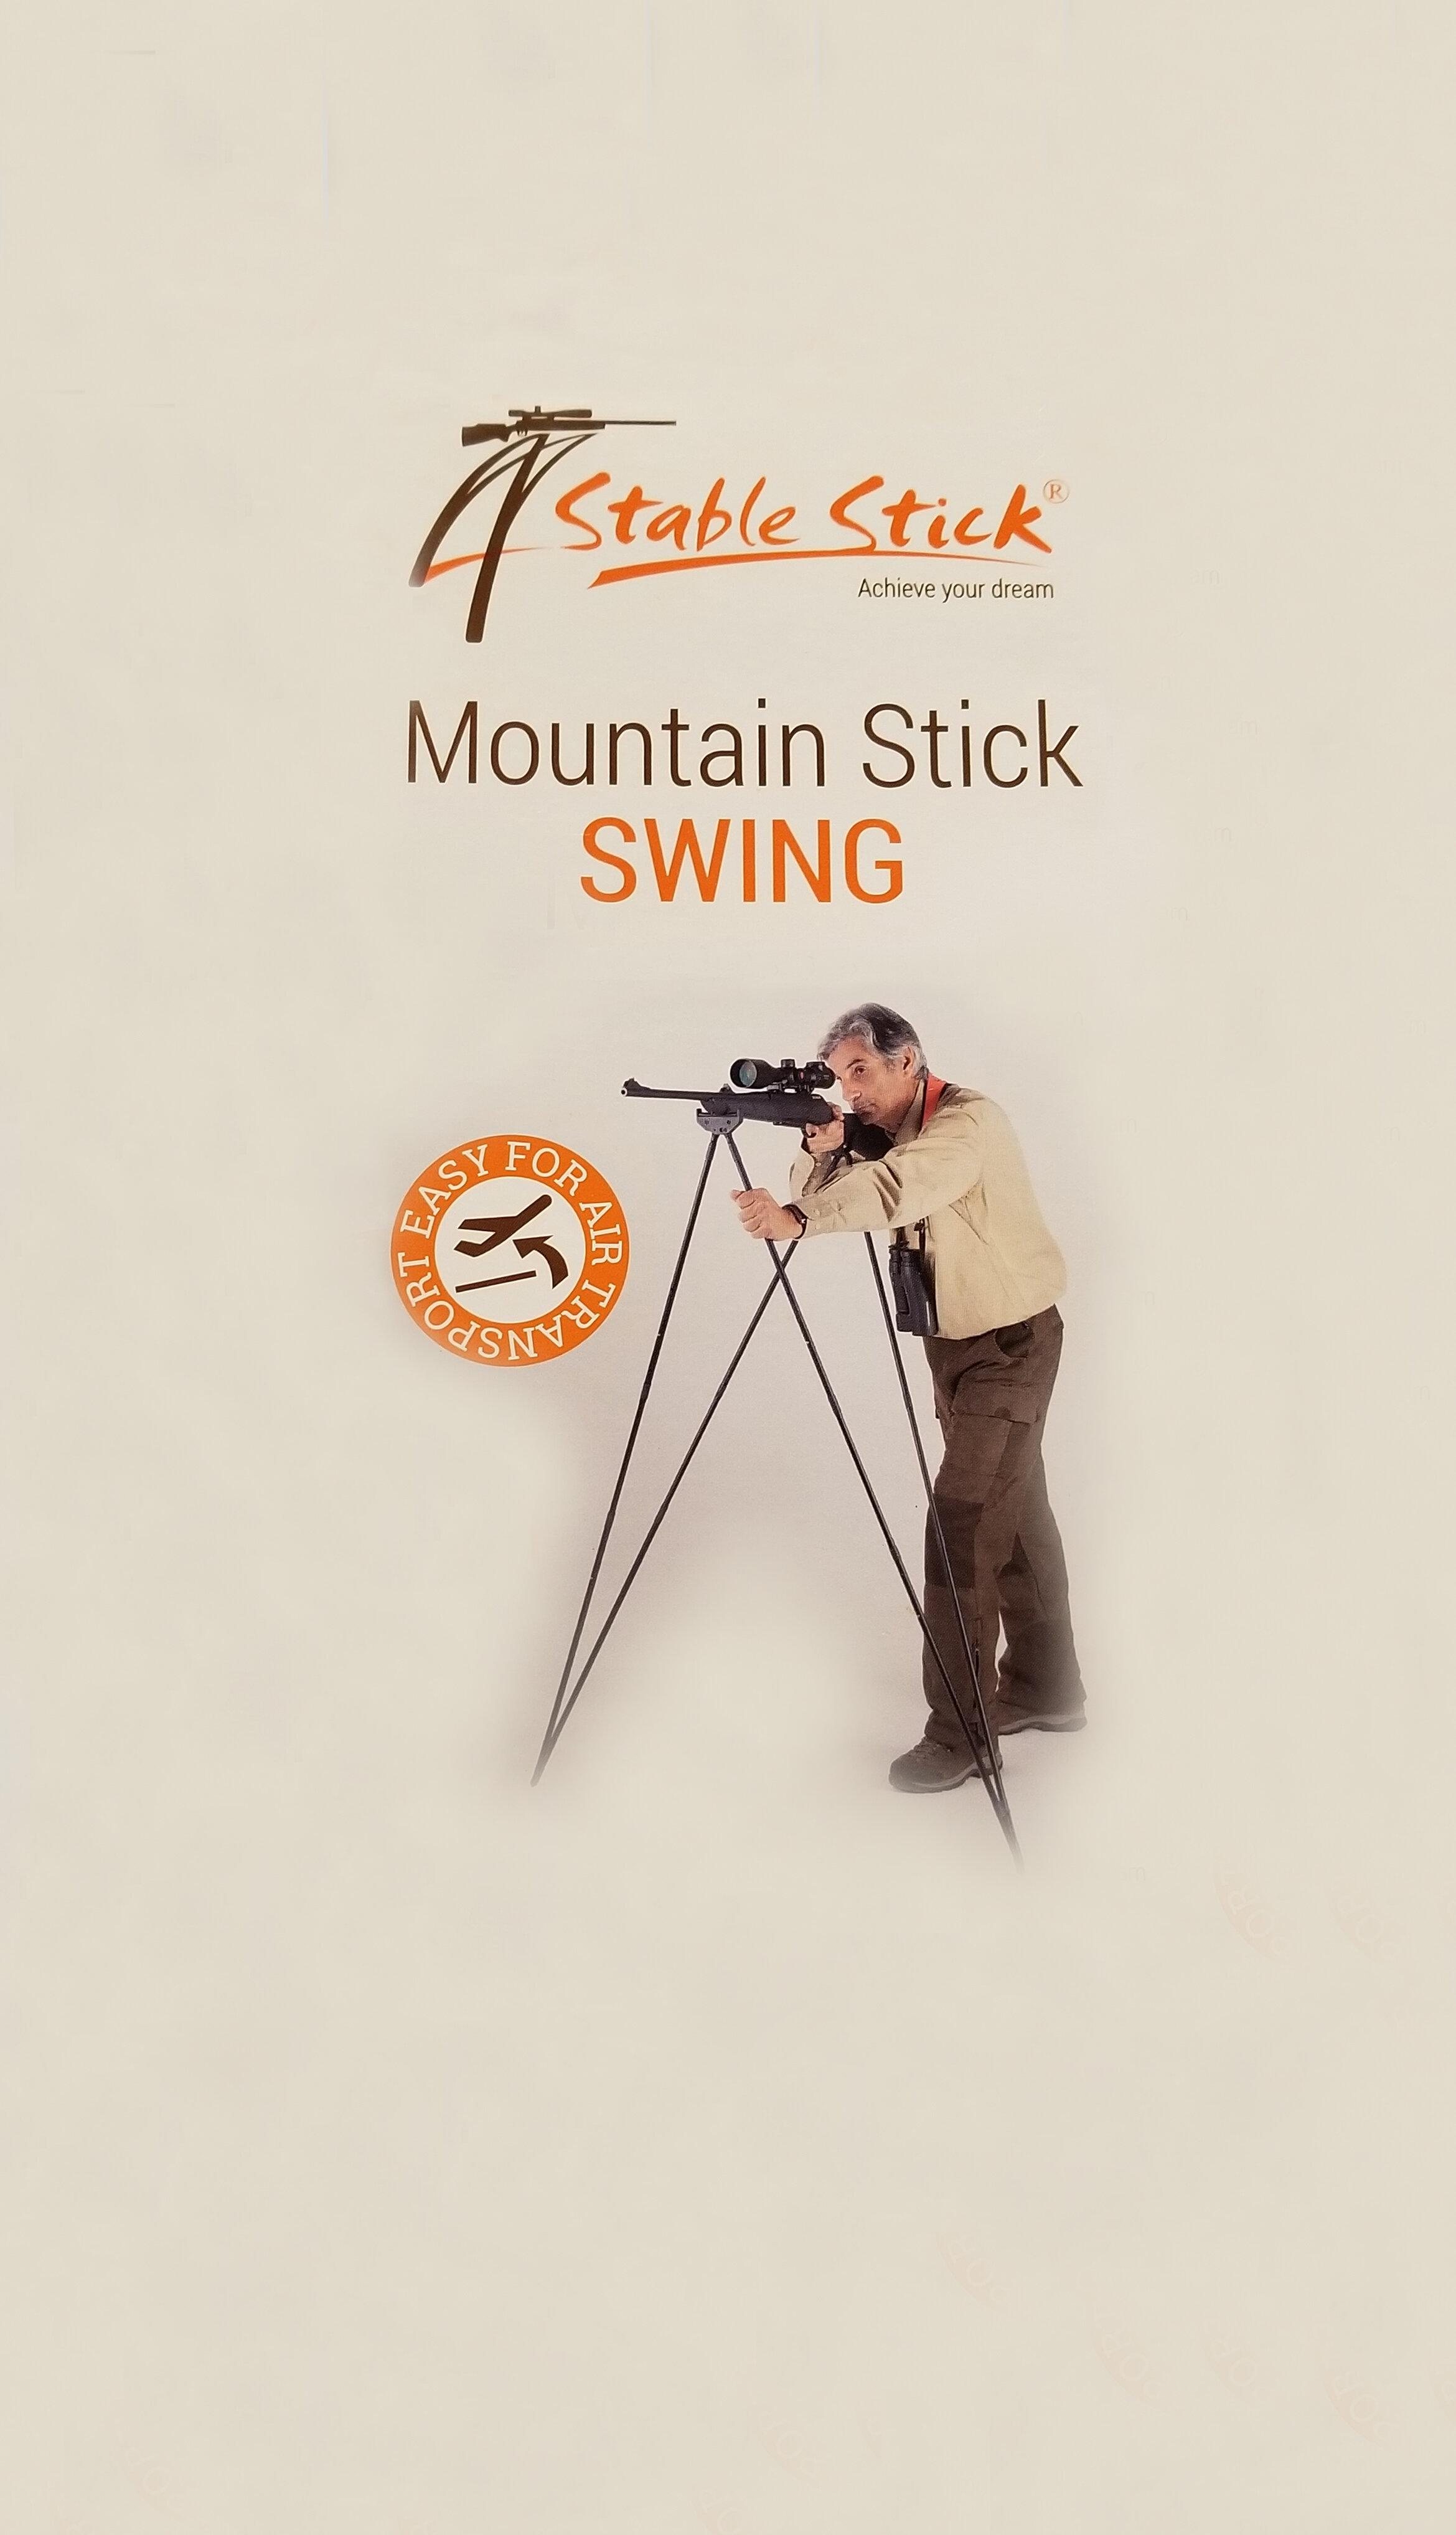 4StableStick Mountain Stick flyer.jpg